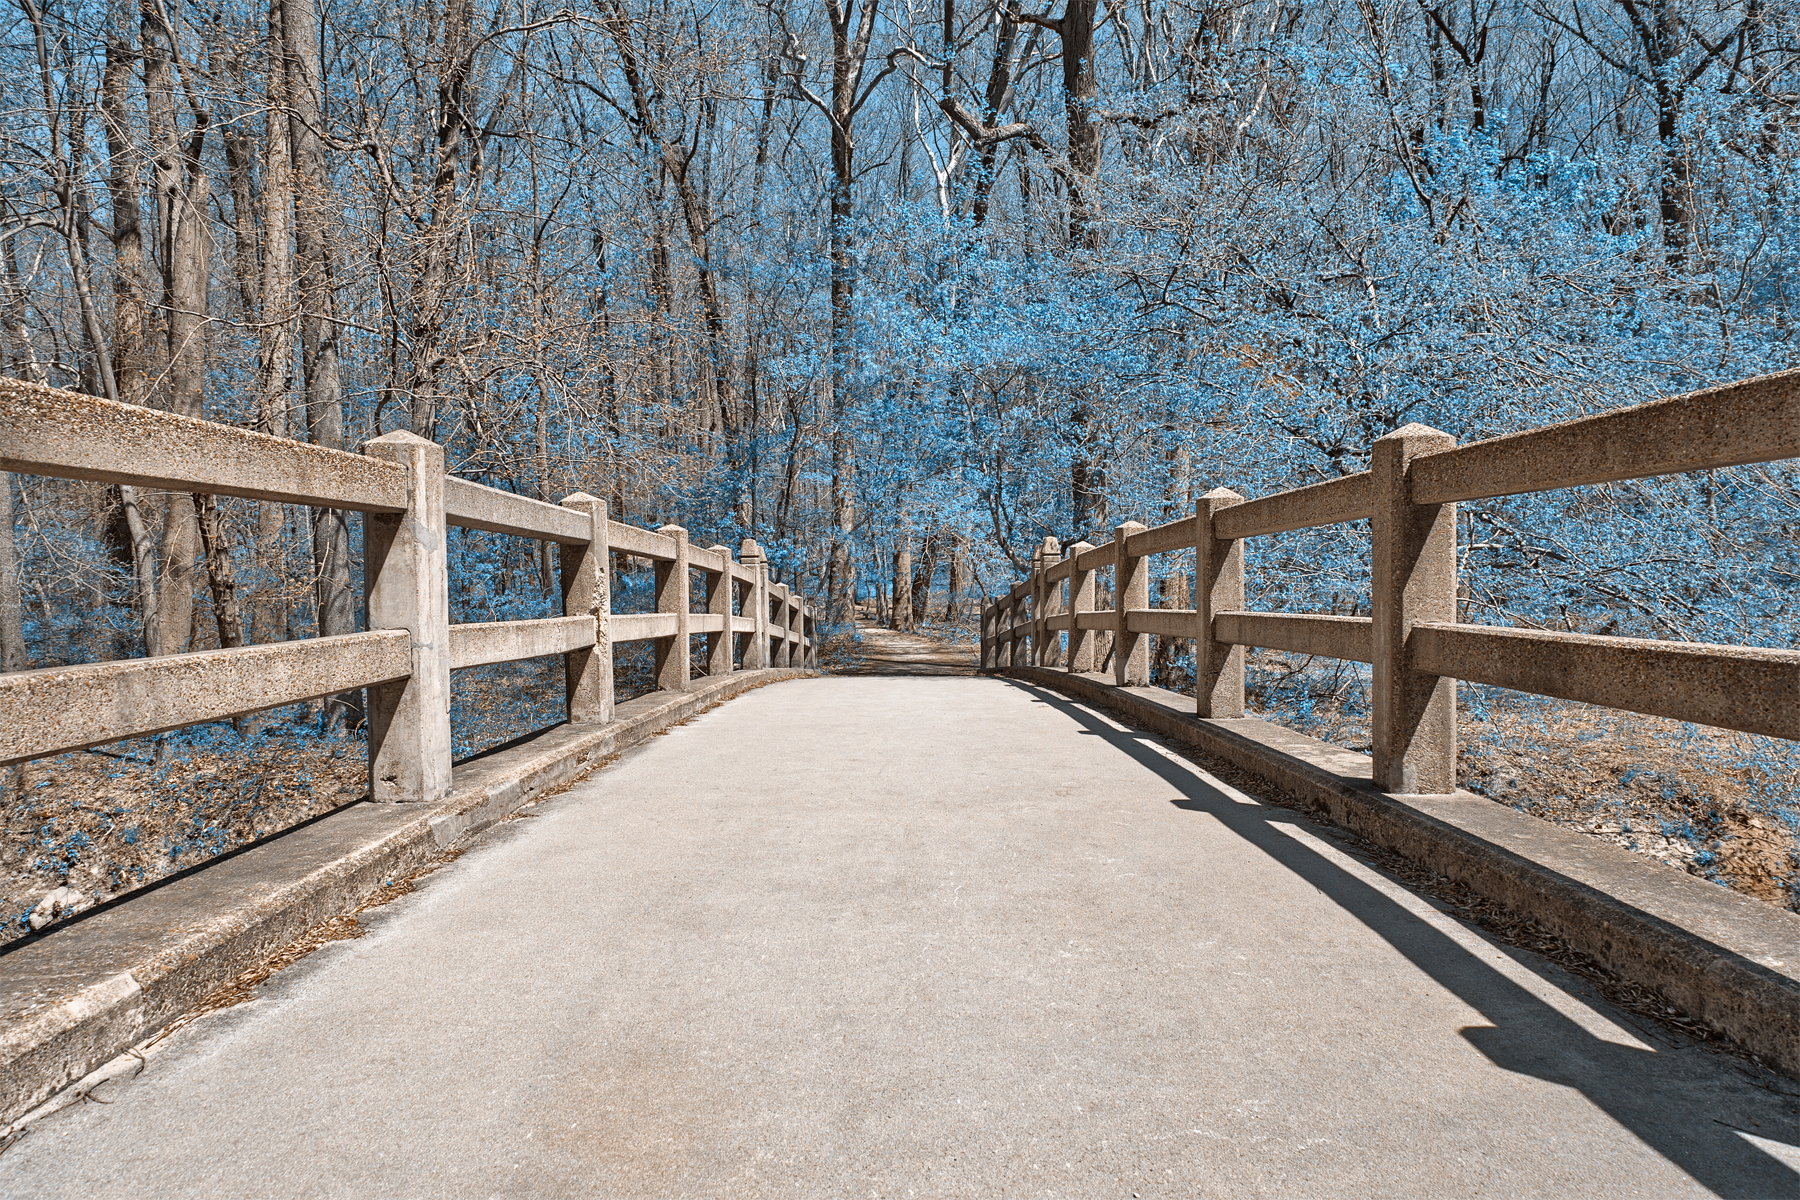 Bridge to winter - hdr photo